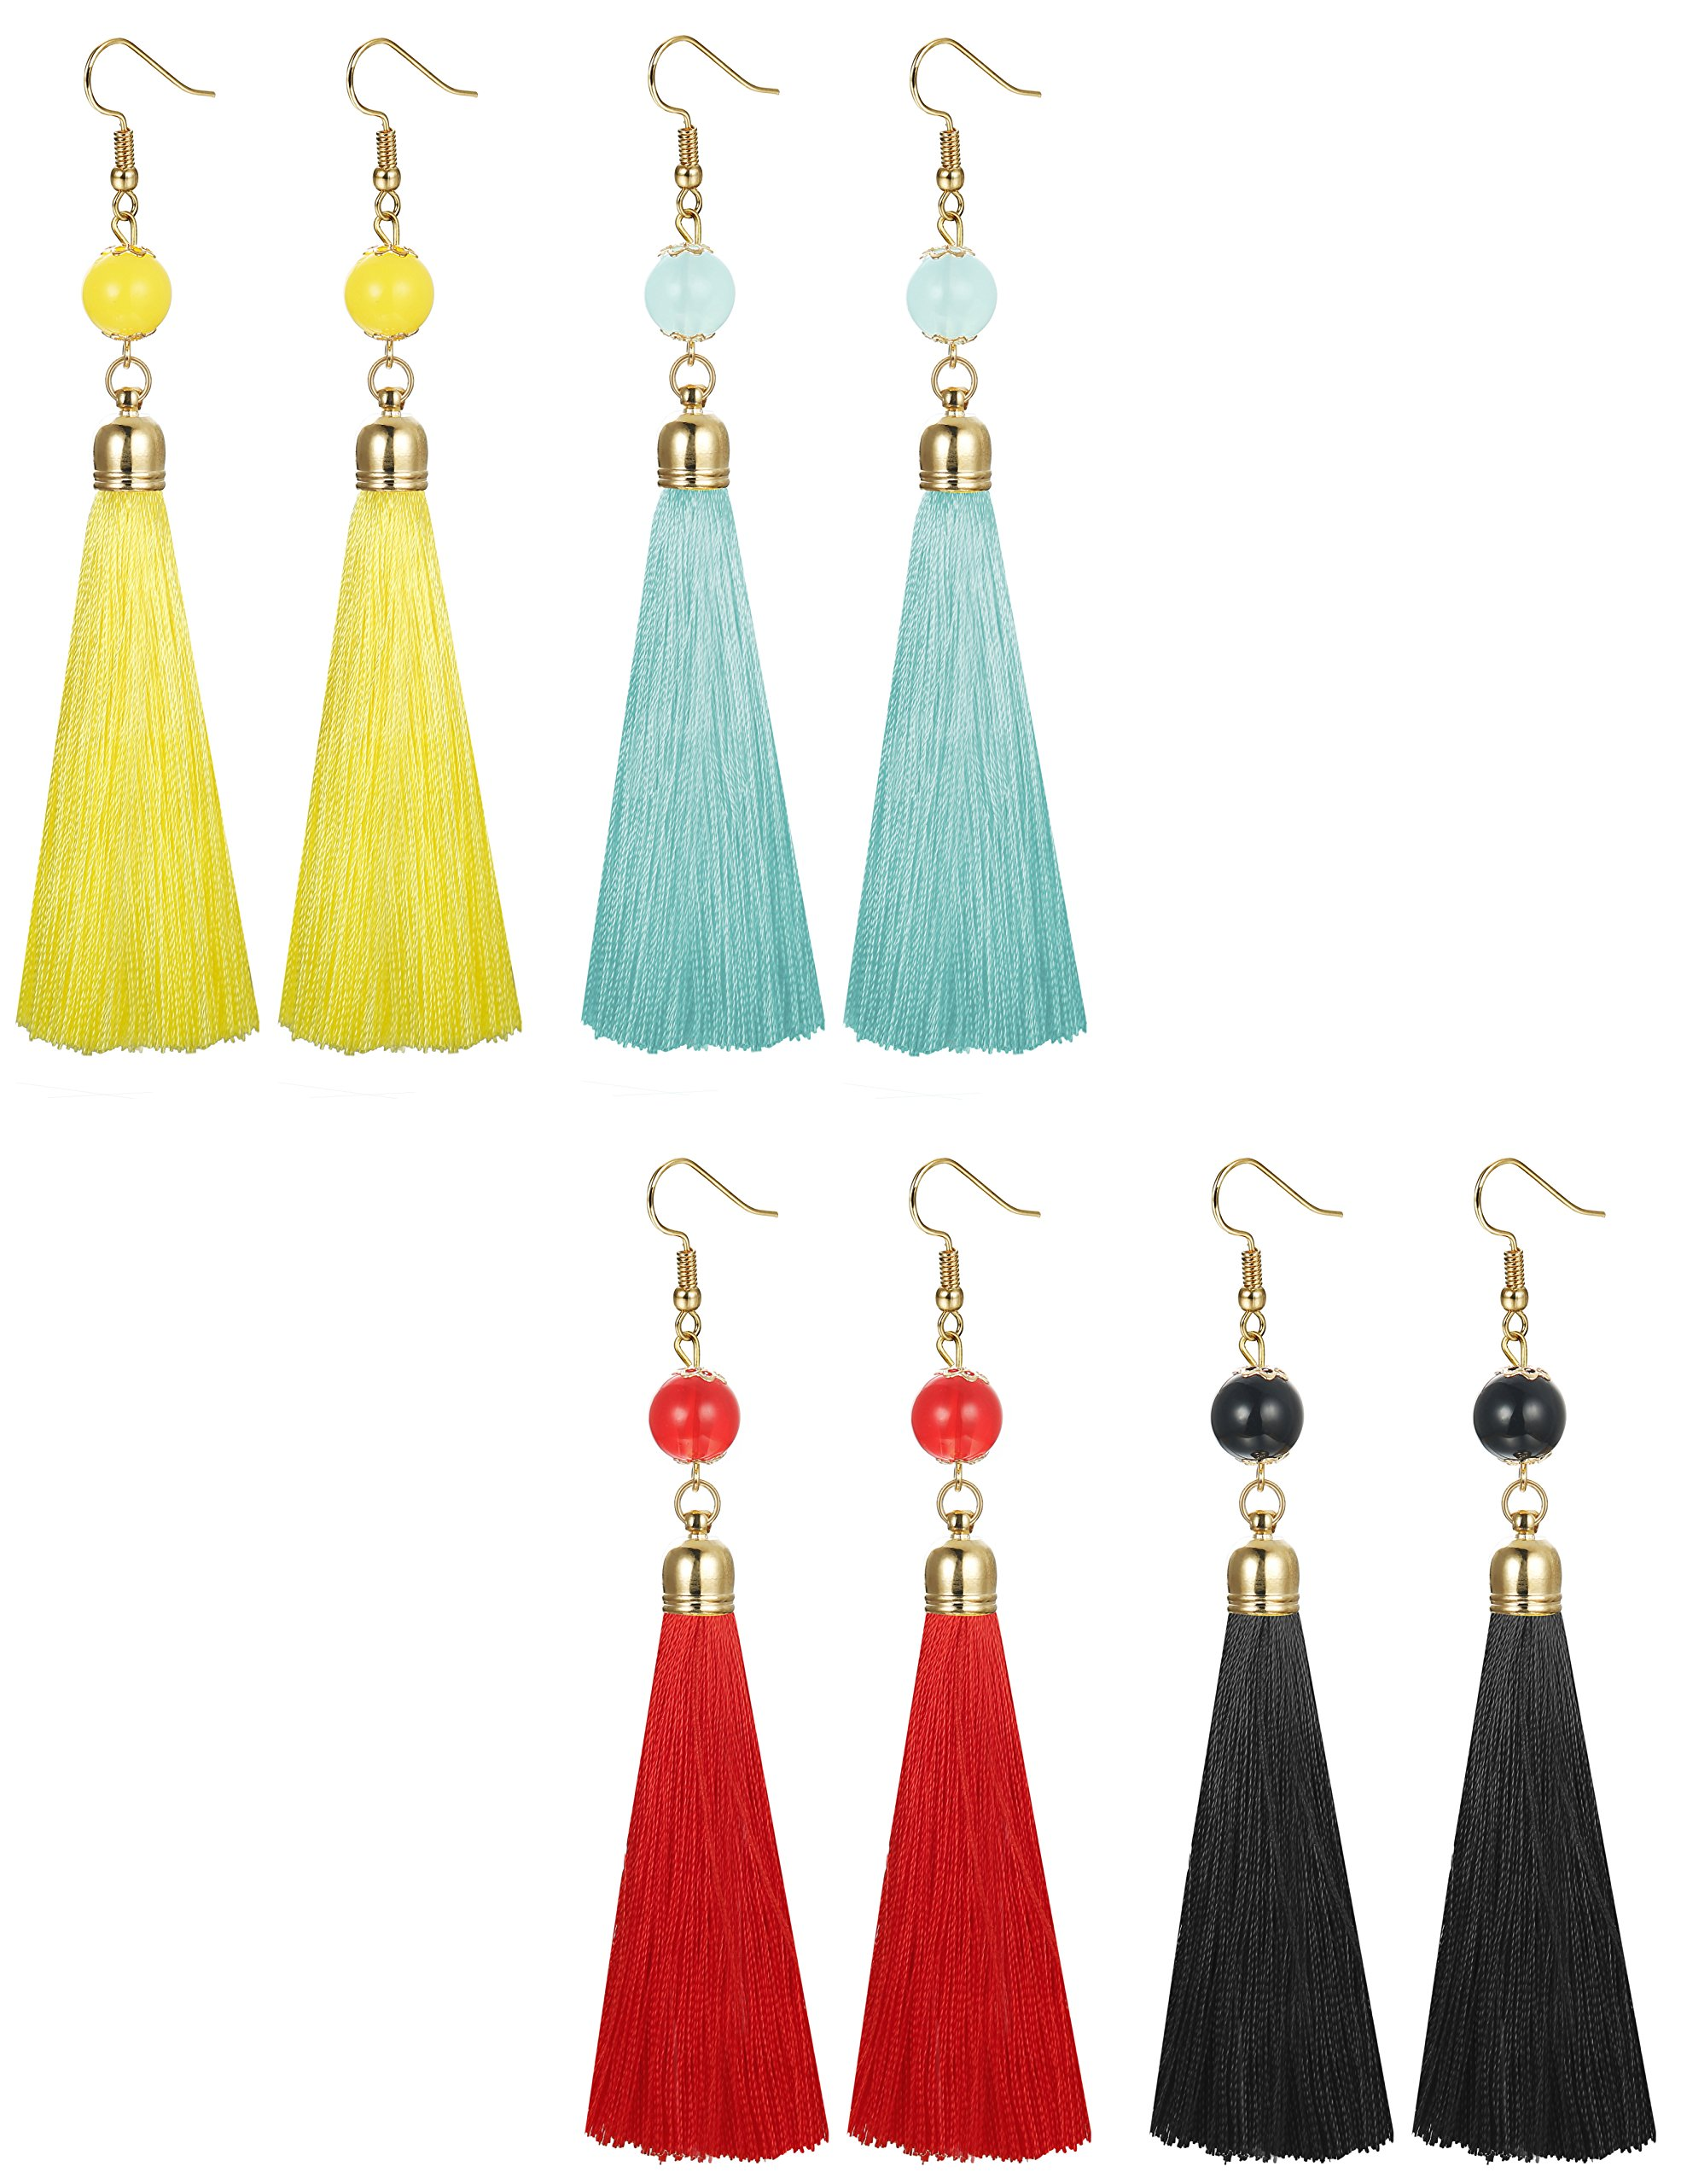 LOLIAS 4 Pairs Thread Tassel Earrings Set Long Dangle Earings for Women Girls